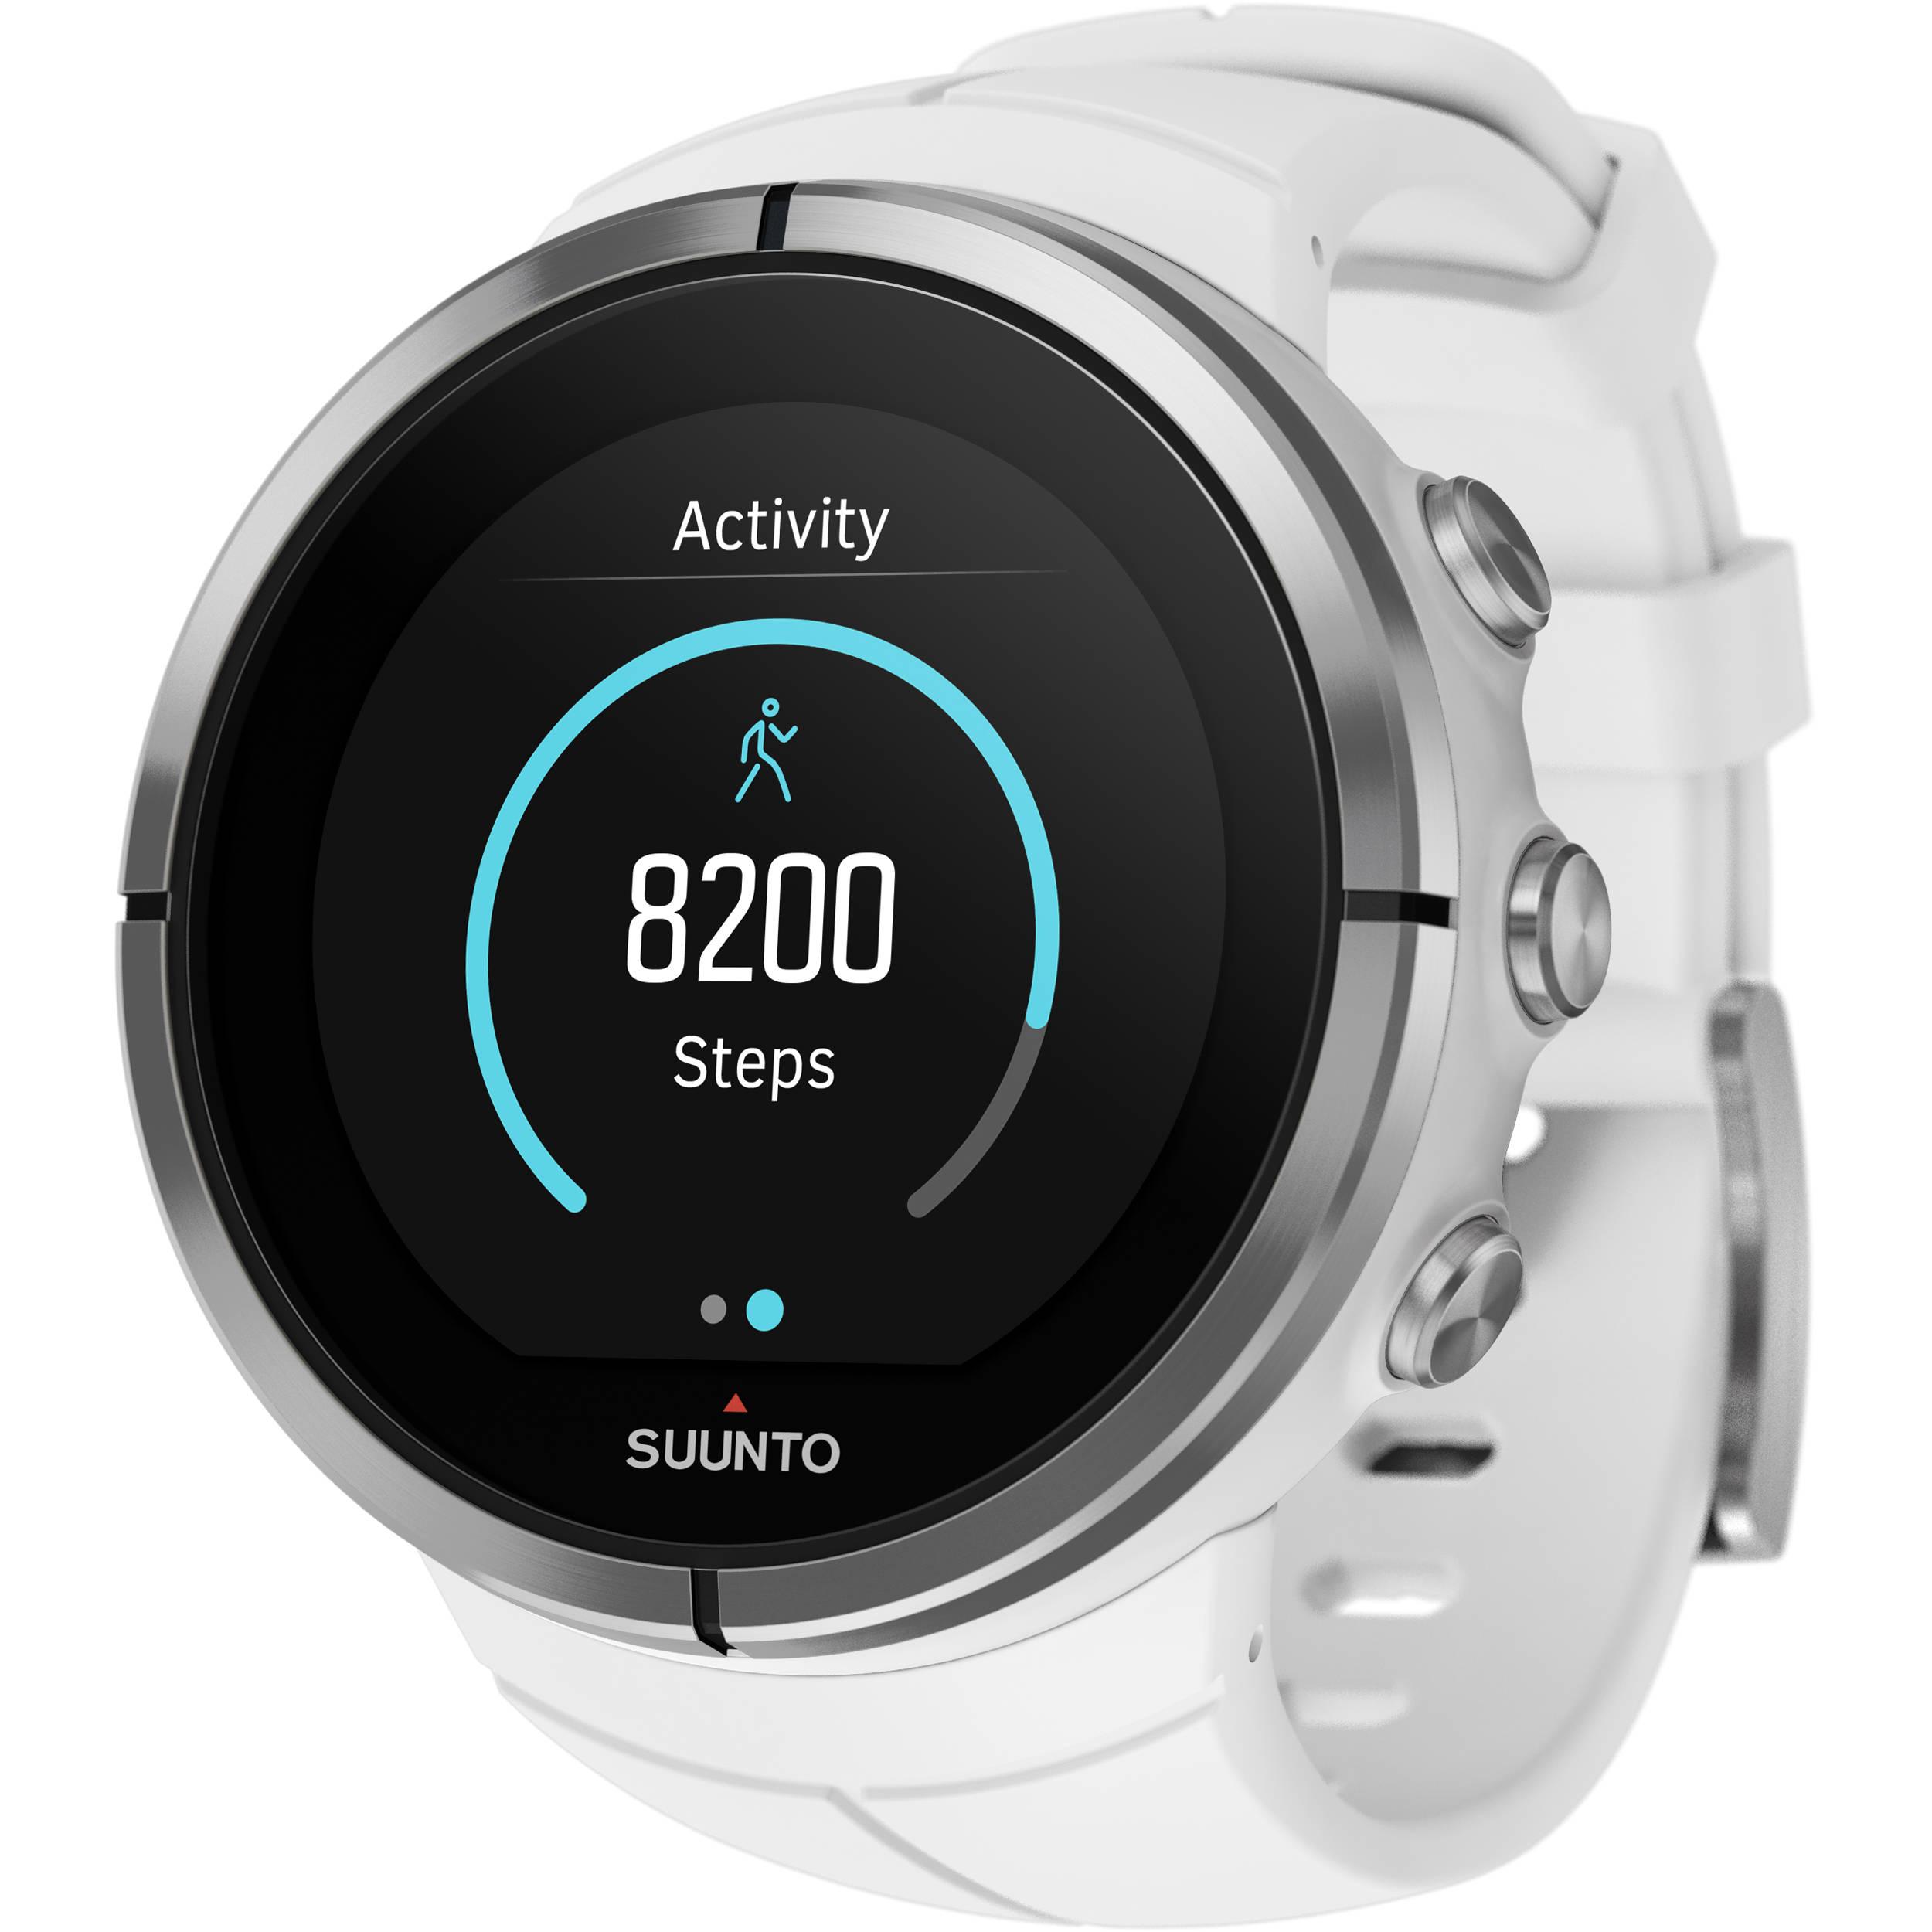 SUUNTO Spartan Ultra Sport Watch (White) SS022661000 B&H Photo